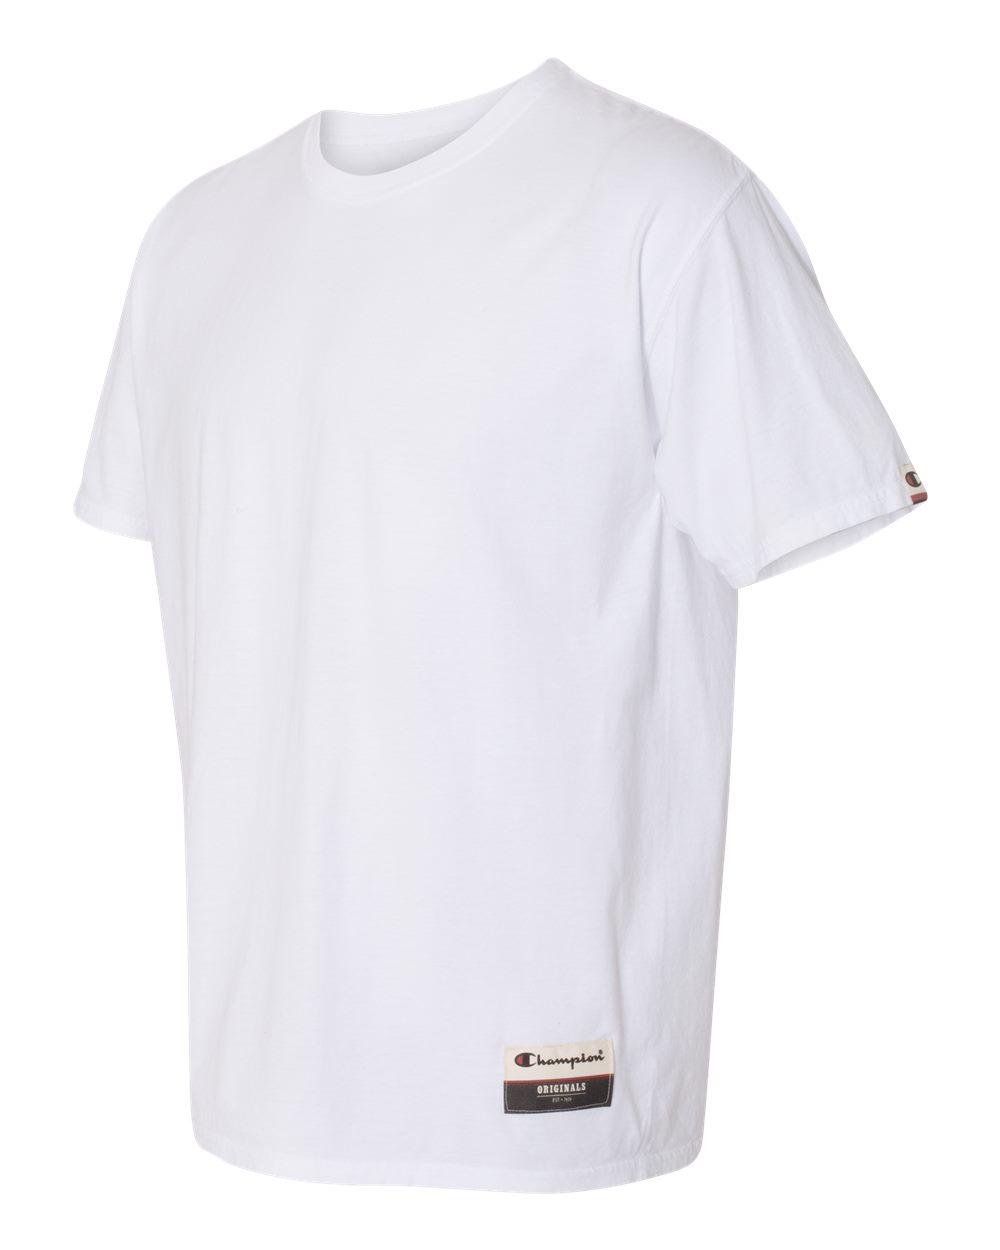 Champion AO200 - Authentic Originals Soft-Wash T-Shirt